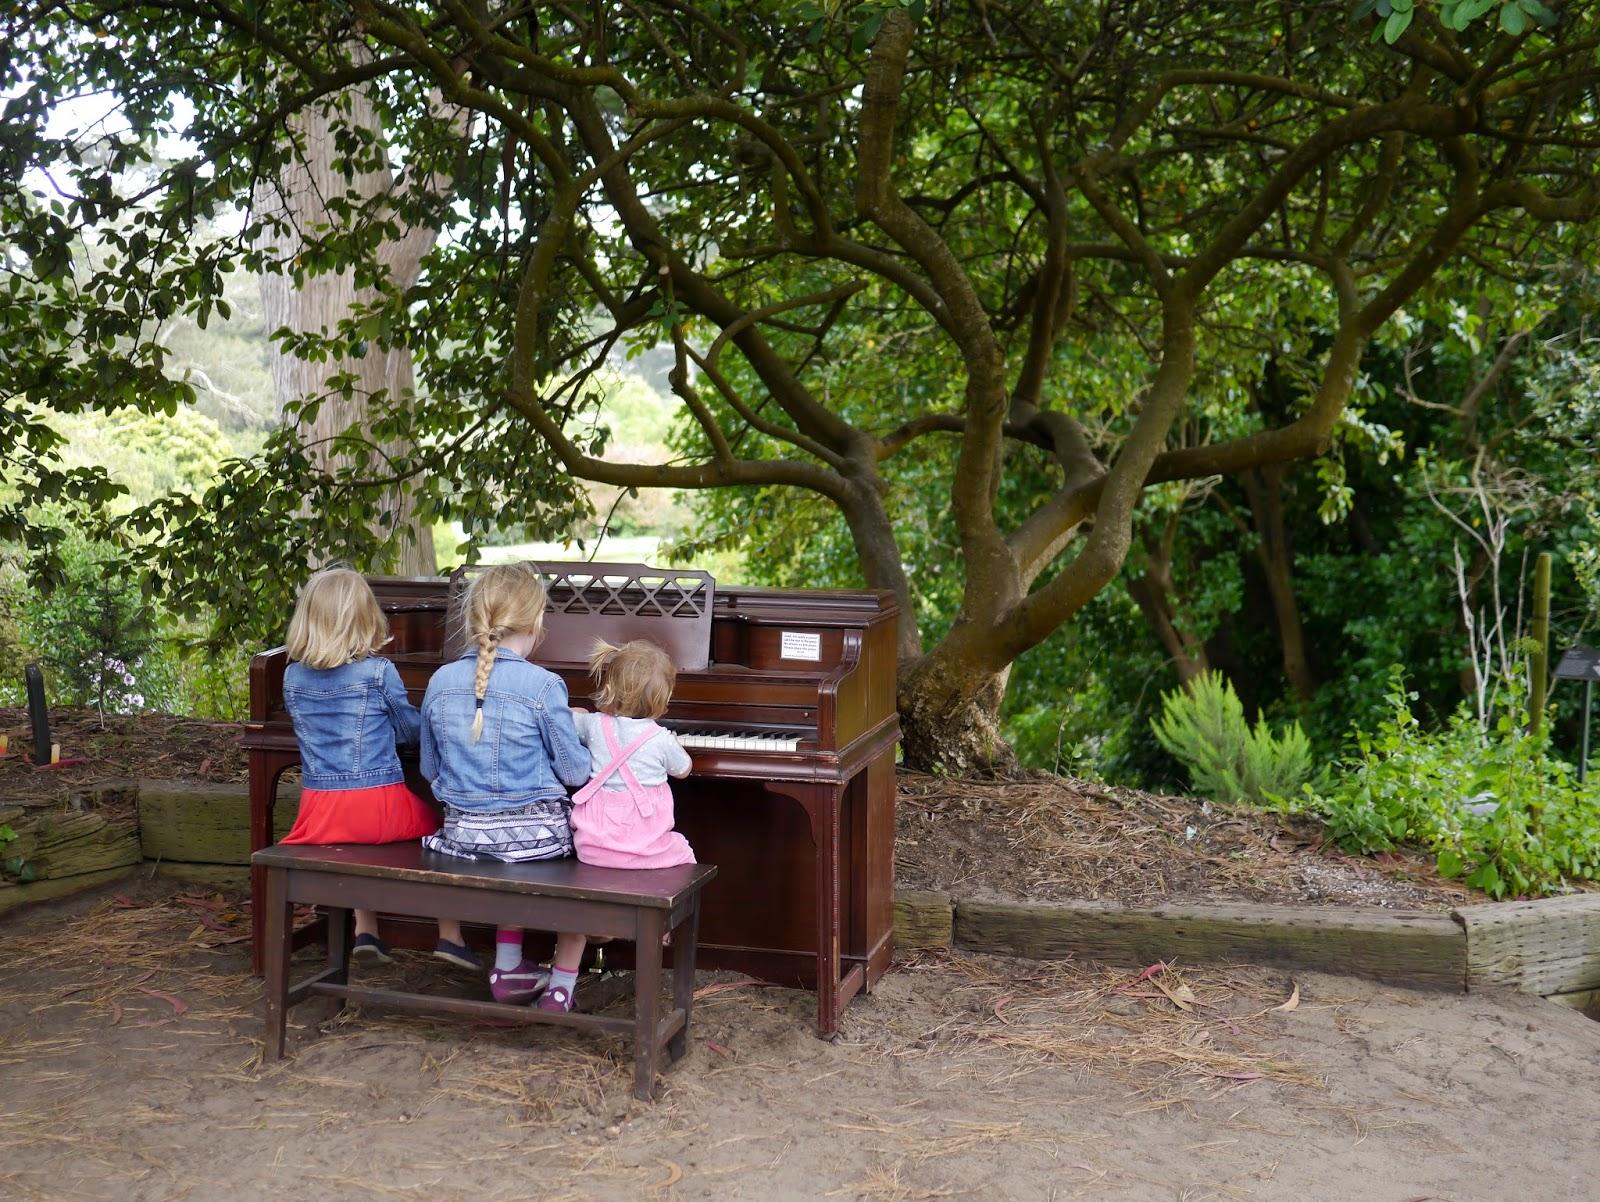 Summer 2017: Flower Piano Returns – Allison Lovejoy